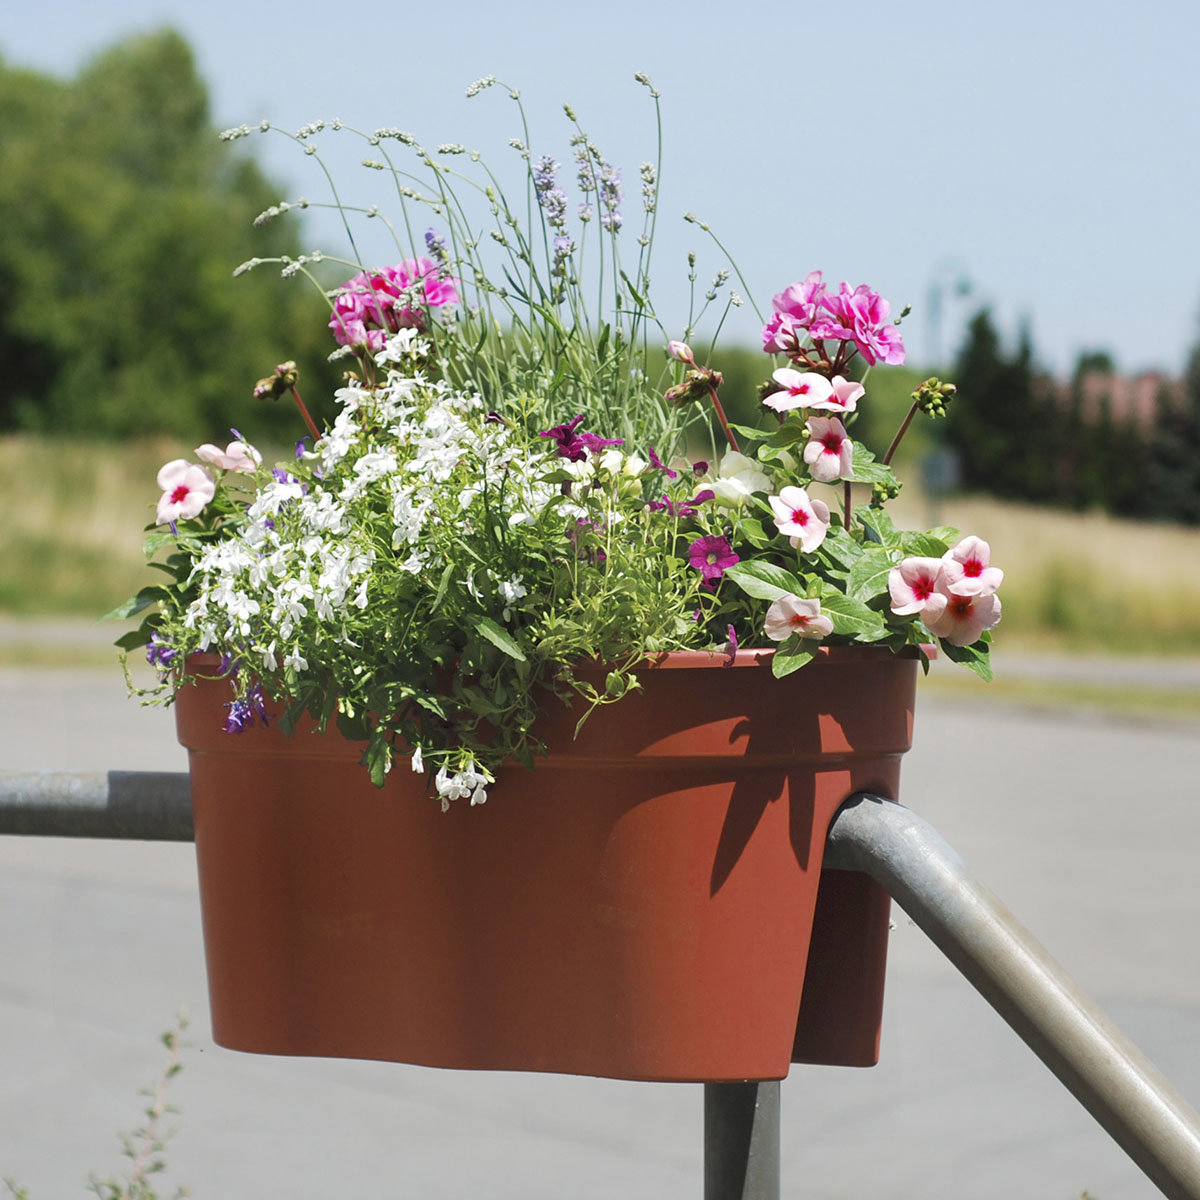 Geländertopf Flowerclip, 57,5 x 27,7 x 27 cm, terracotta | #3